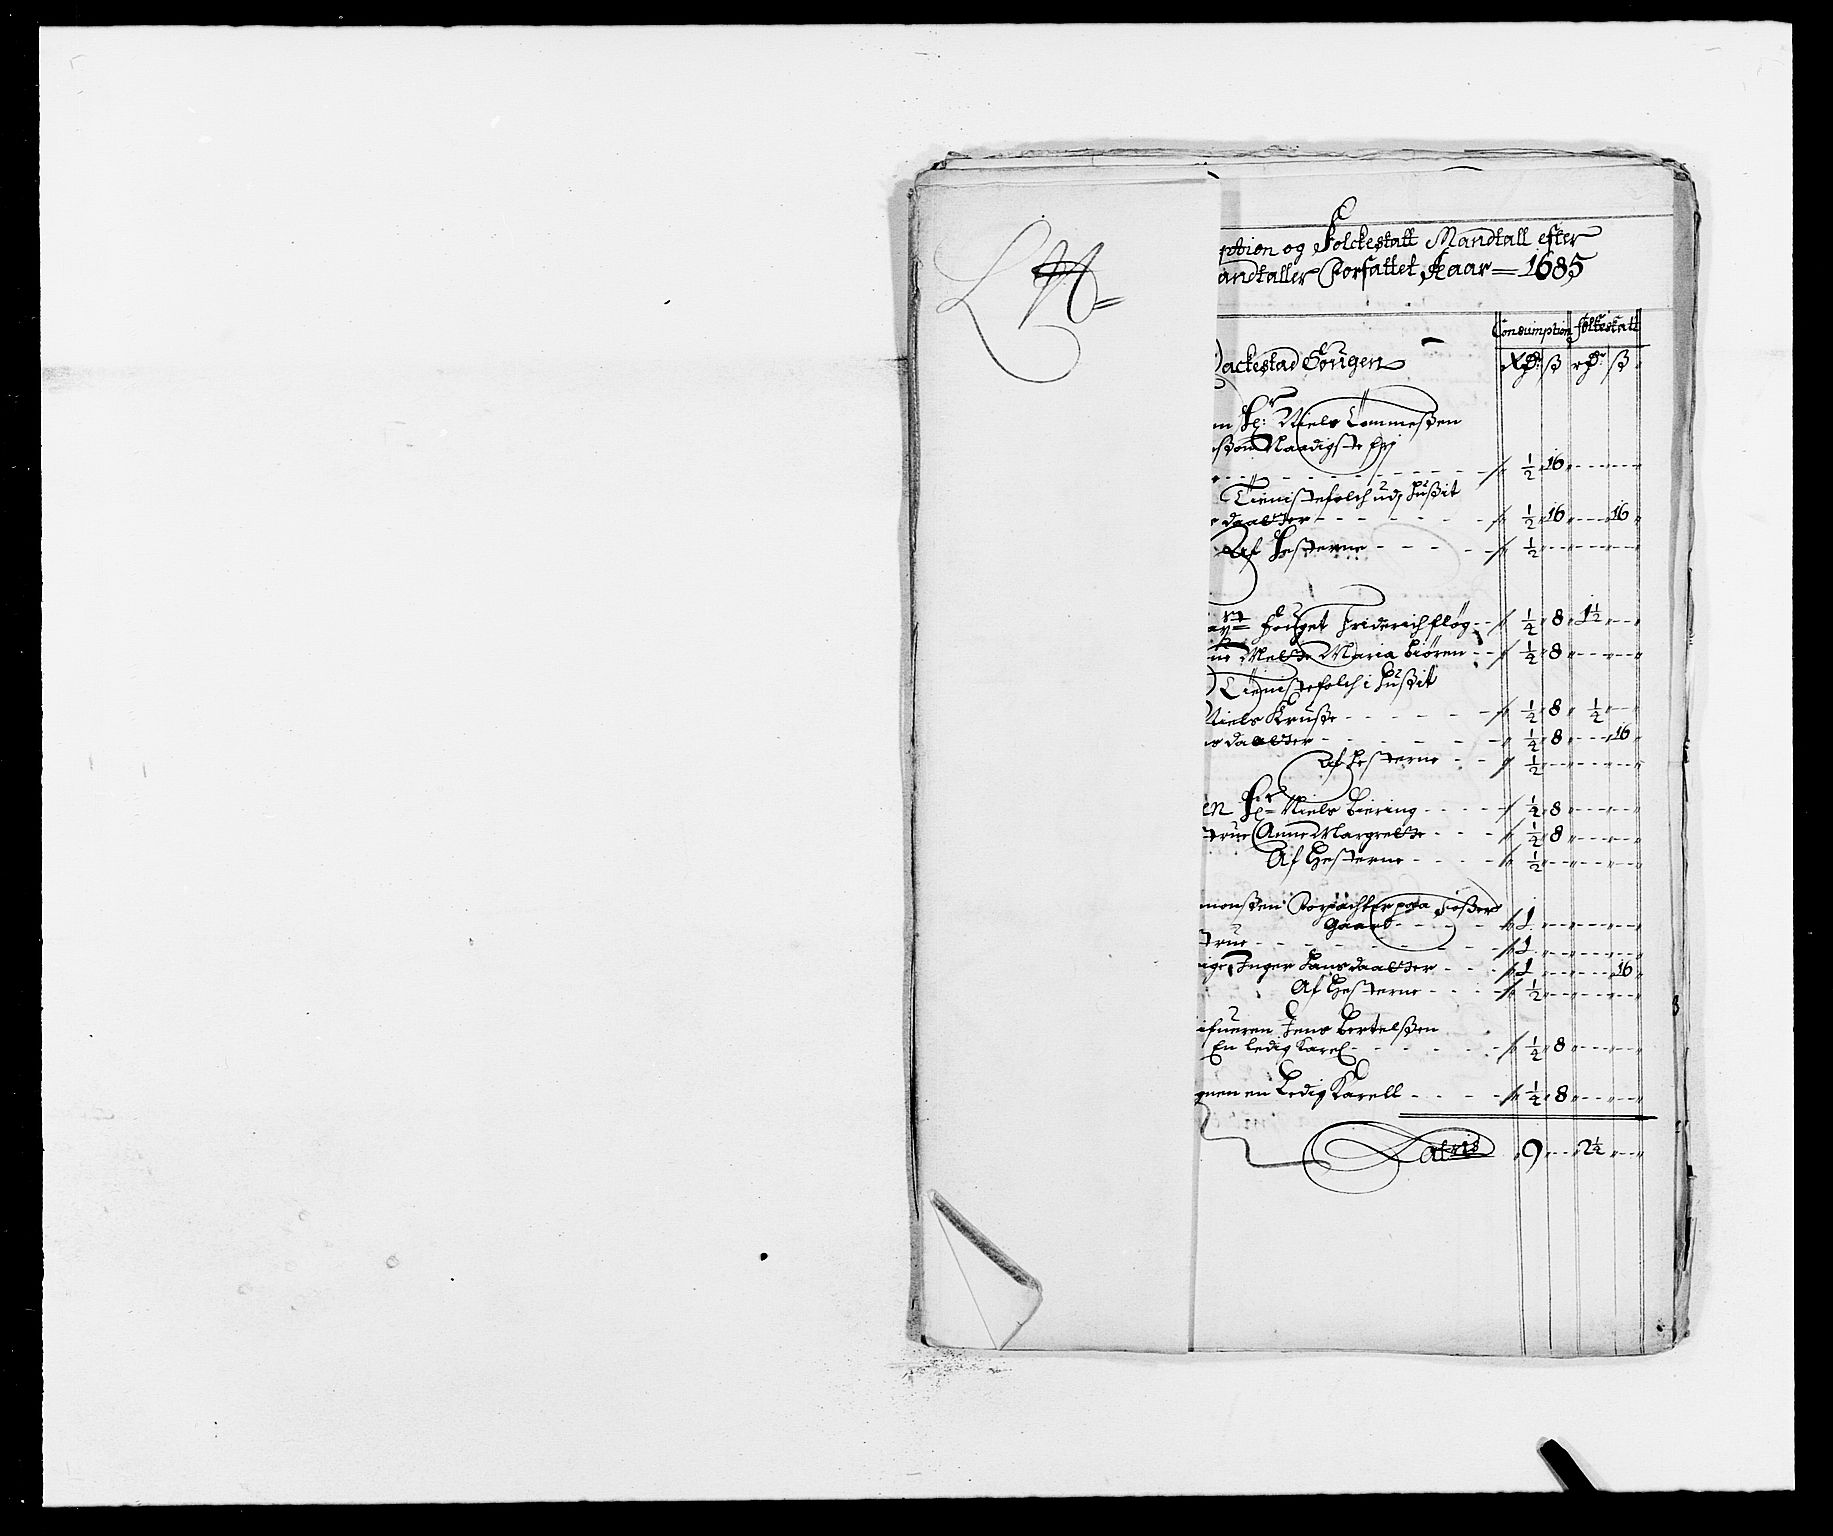 RA, Rentekammeret inntil 1814, Reviderte regnskaper, Fogderegnskap, R05/L0275: Fogderegnskap Rakkestad, 1685-1686, s. 146